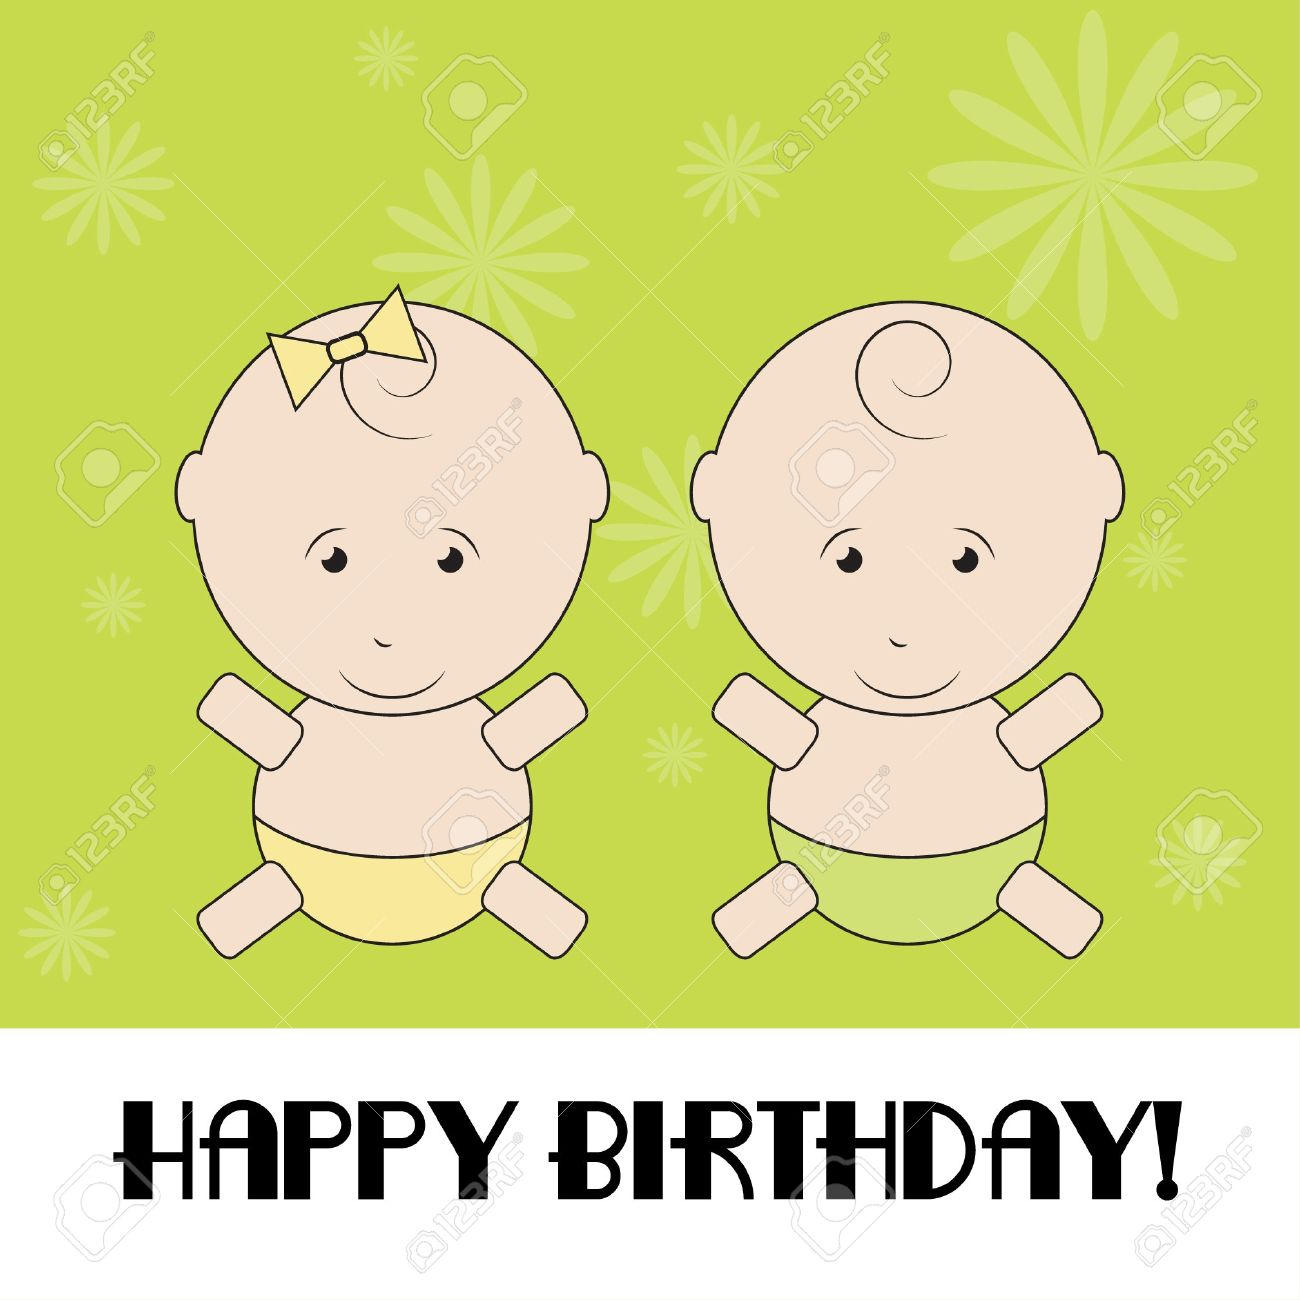 Happy birthday funny greeting card Stock Vector - 13719525